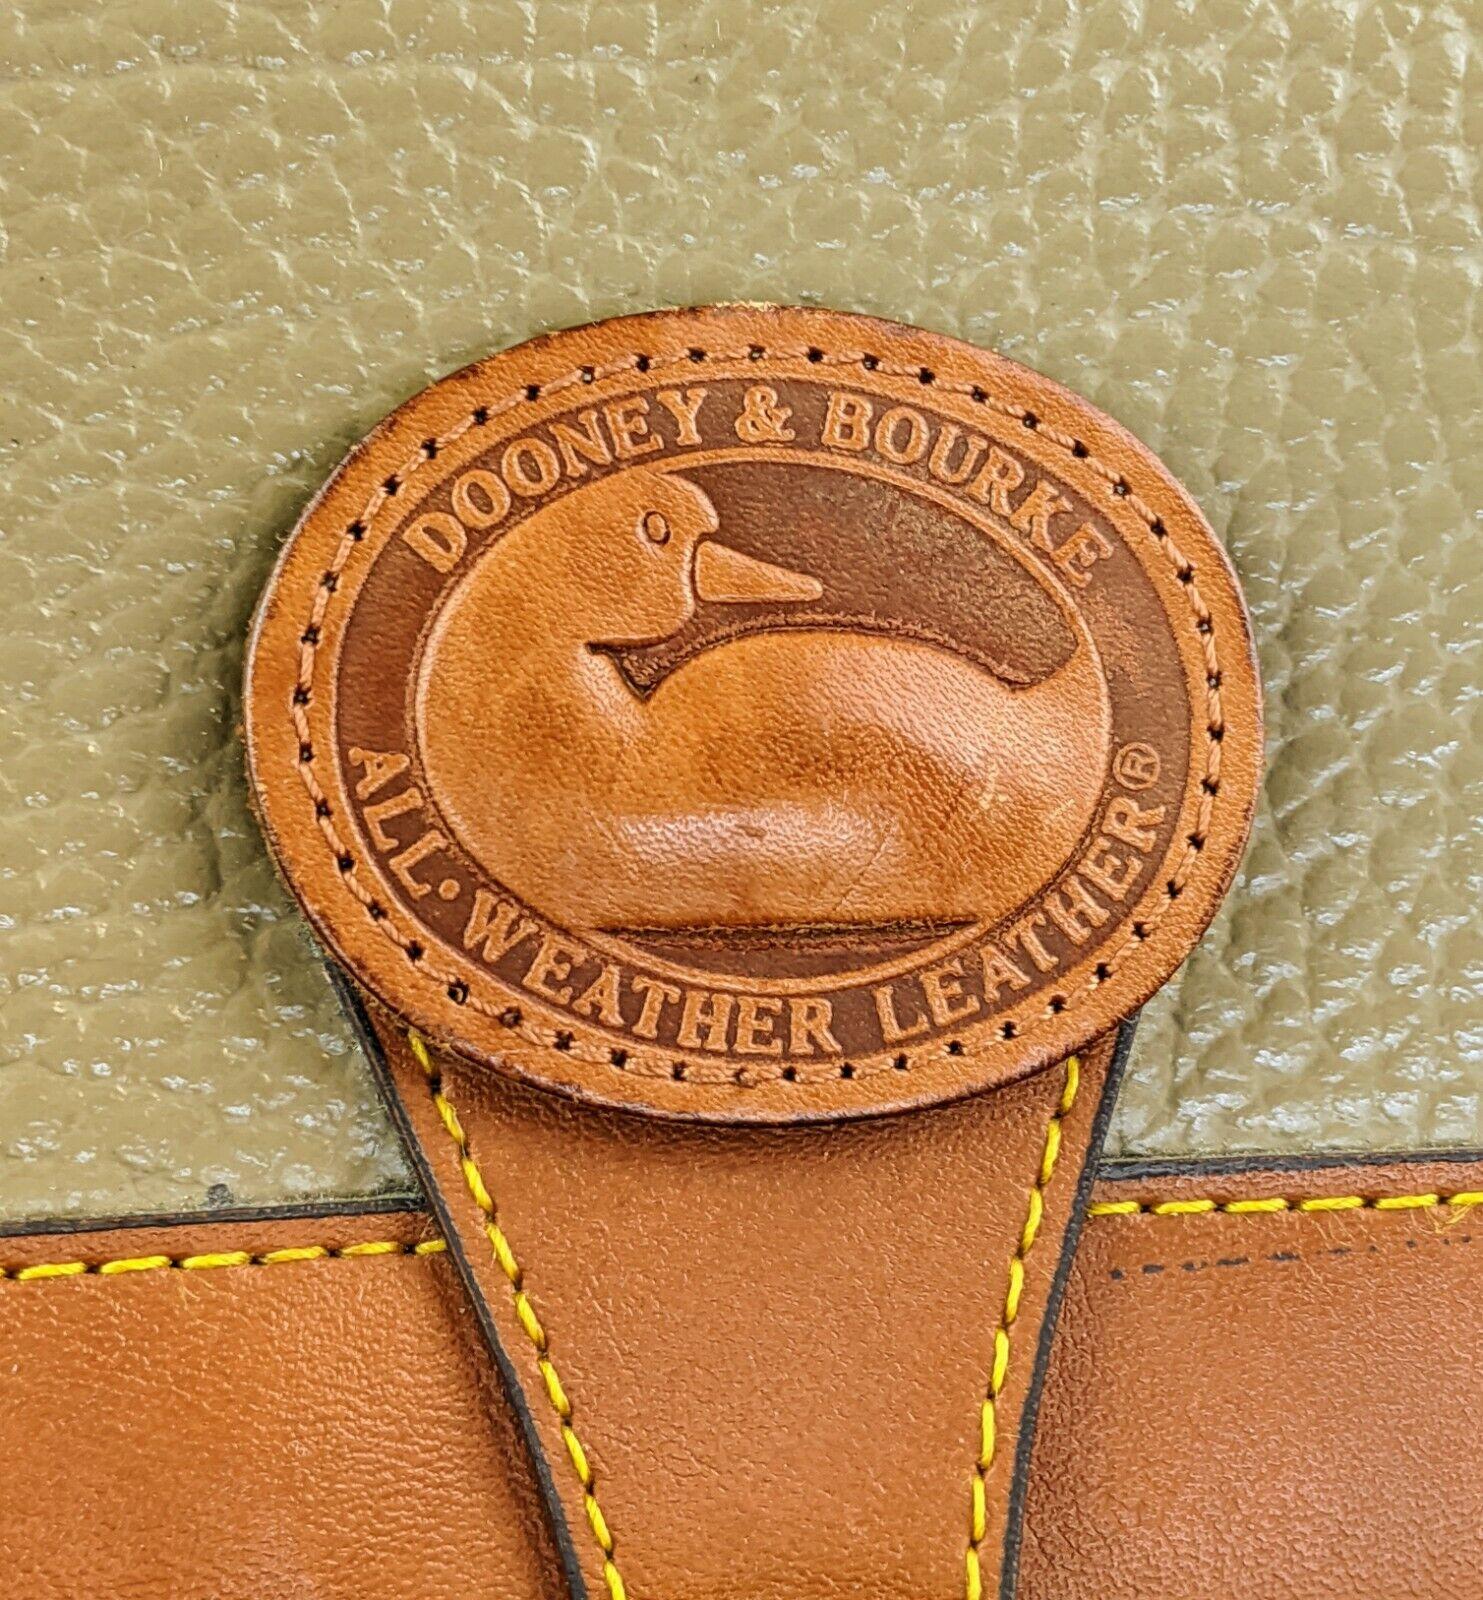 Dooney & Bourke Tan Brown Small Purse Handbag Tra… - image 3